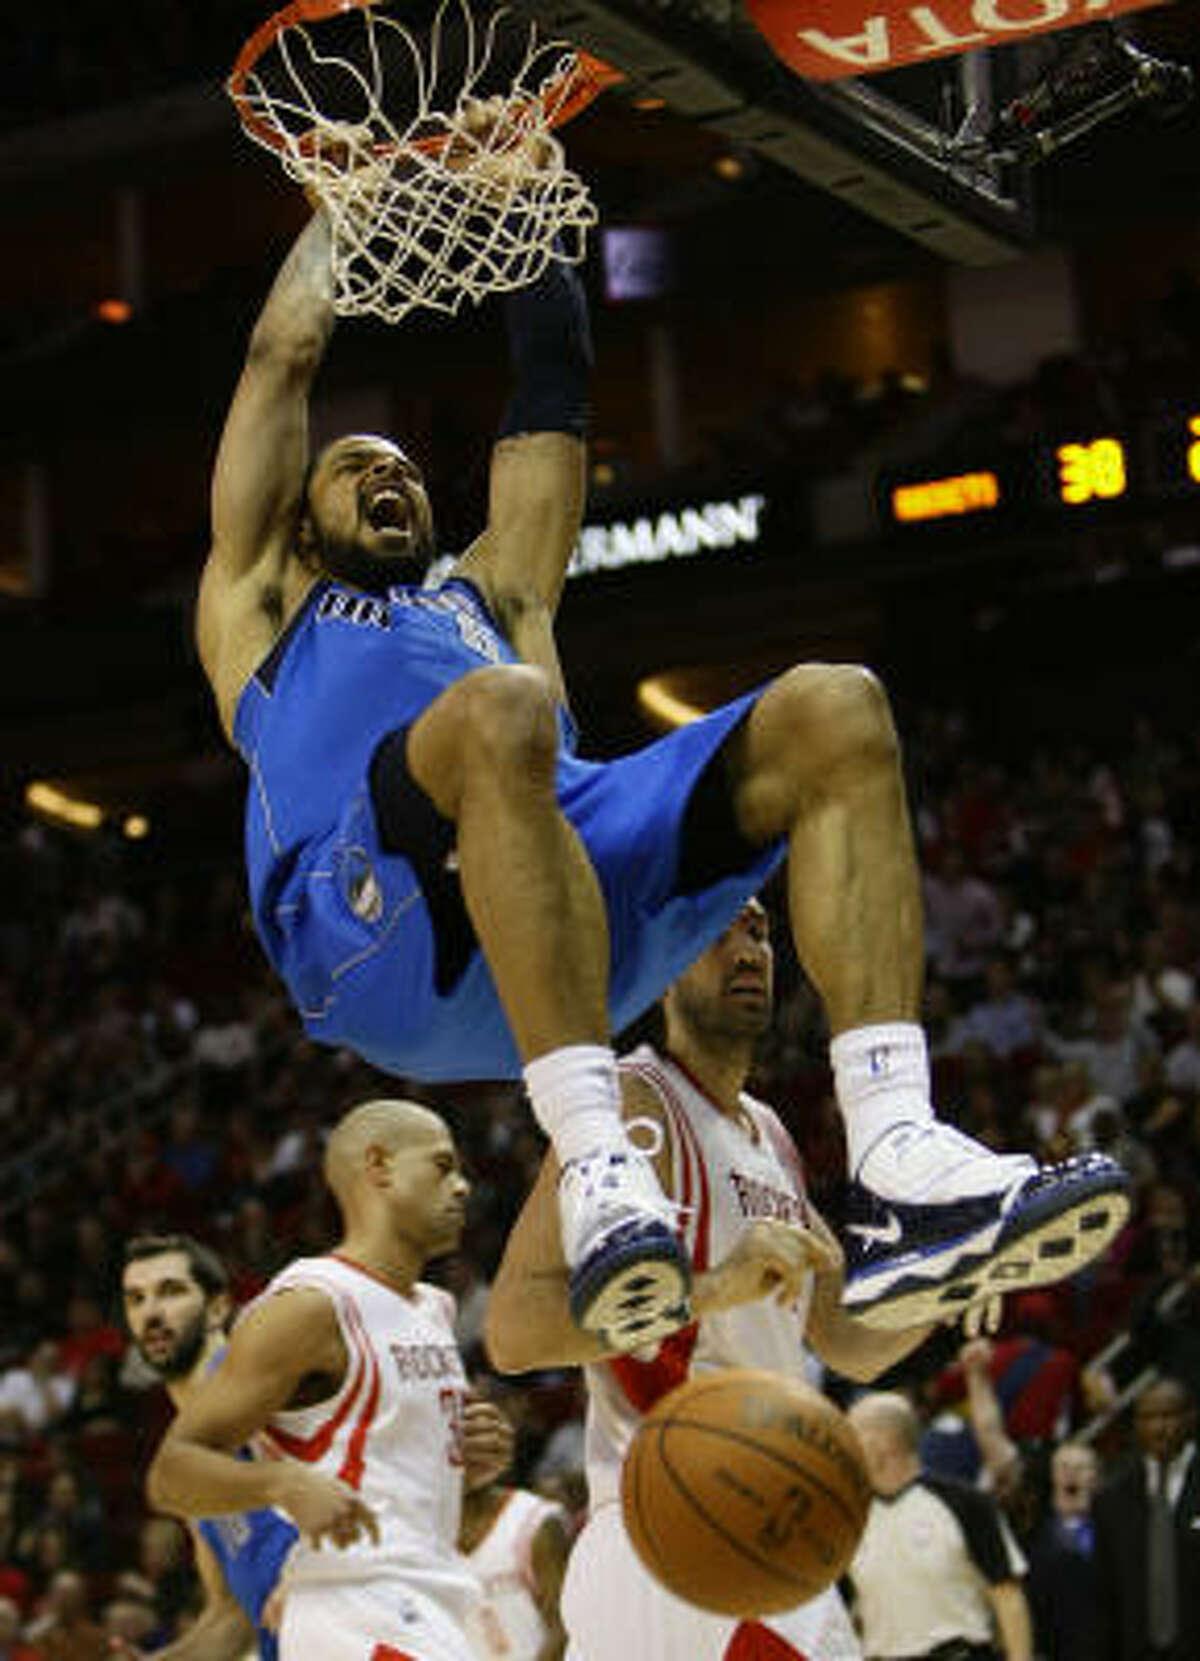 Mavericks center Tyson Chandler (6) gets a monster dunk as Dallas pulls away from the Rockets in the second quarter.